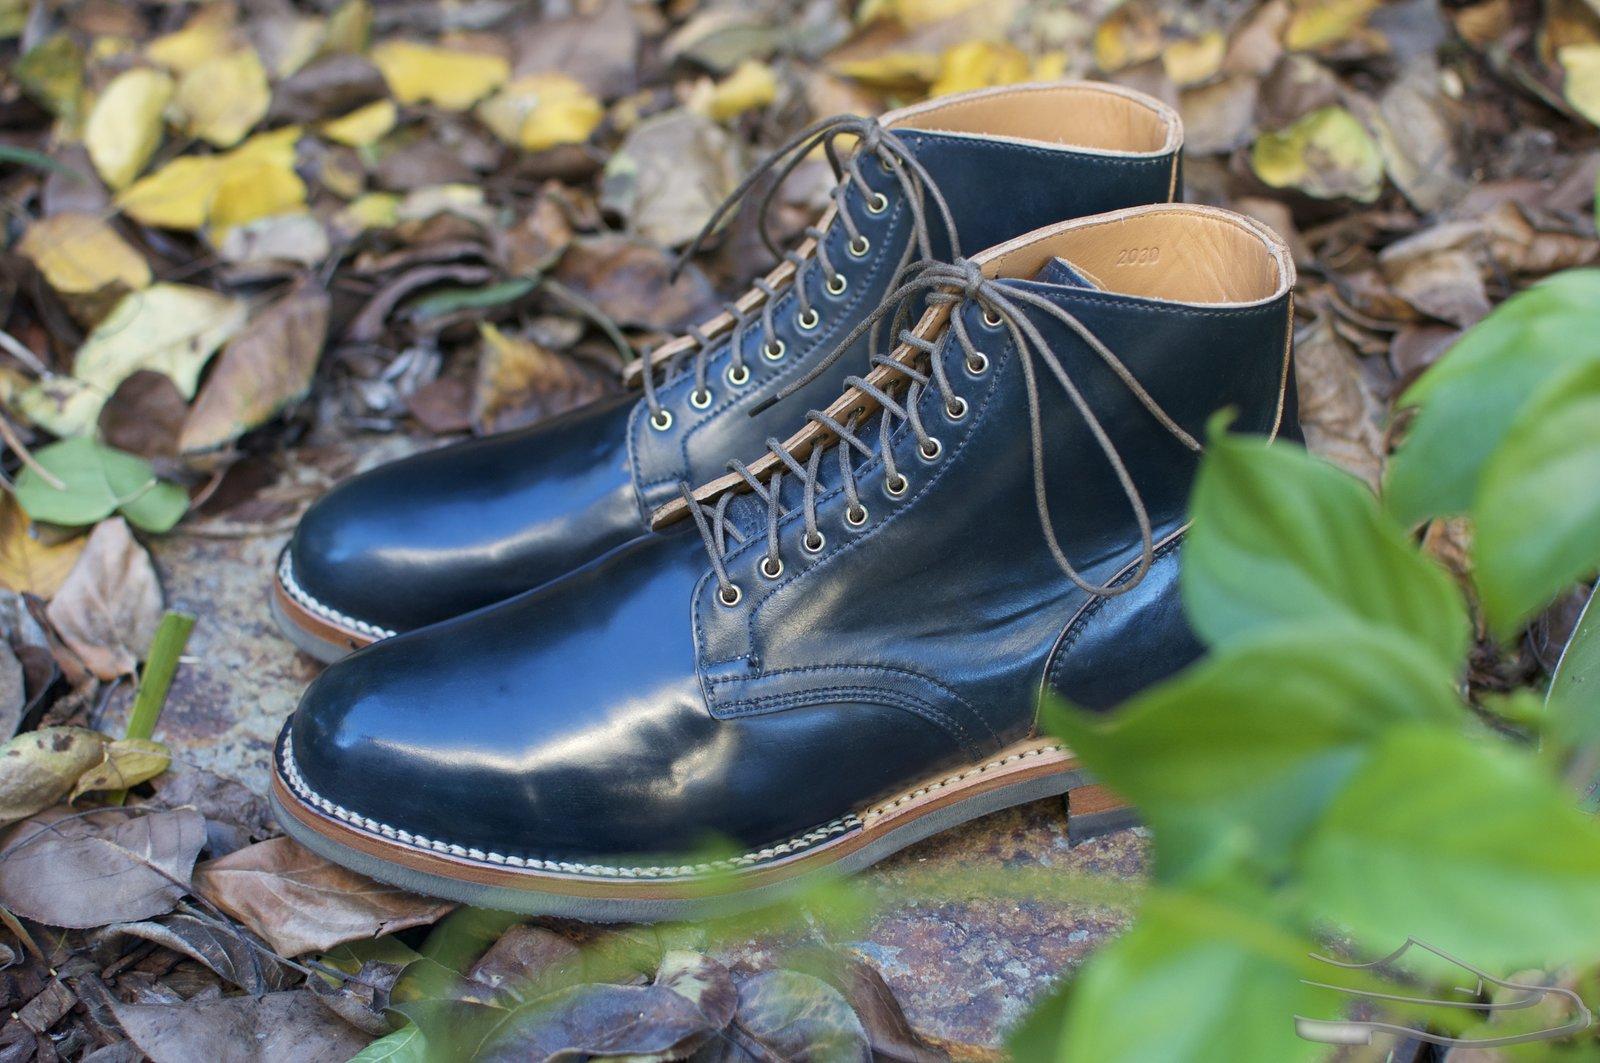 Viberg Intense Blue Shell Cordovan Service Boots - 2020-12-04 - 3.jpg